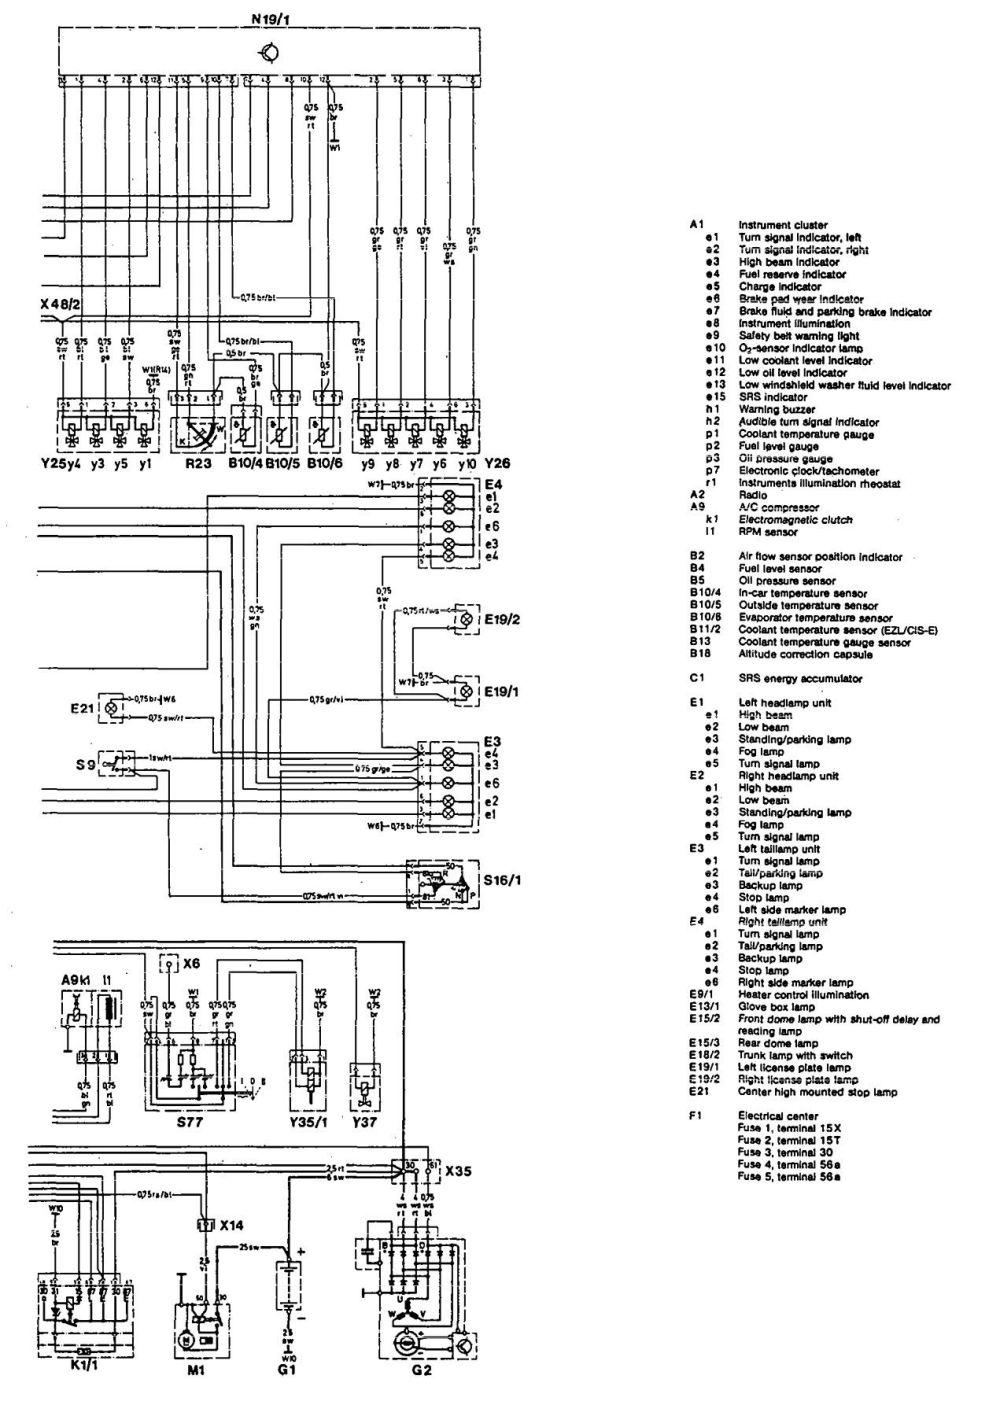 medium resolution of 2001 mercedes benz c240 fuse box map besides 1995 mercedes benz c 220 fuse box diagram